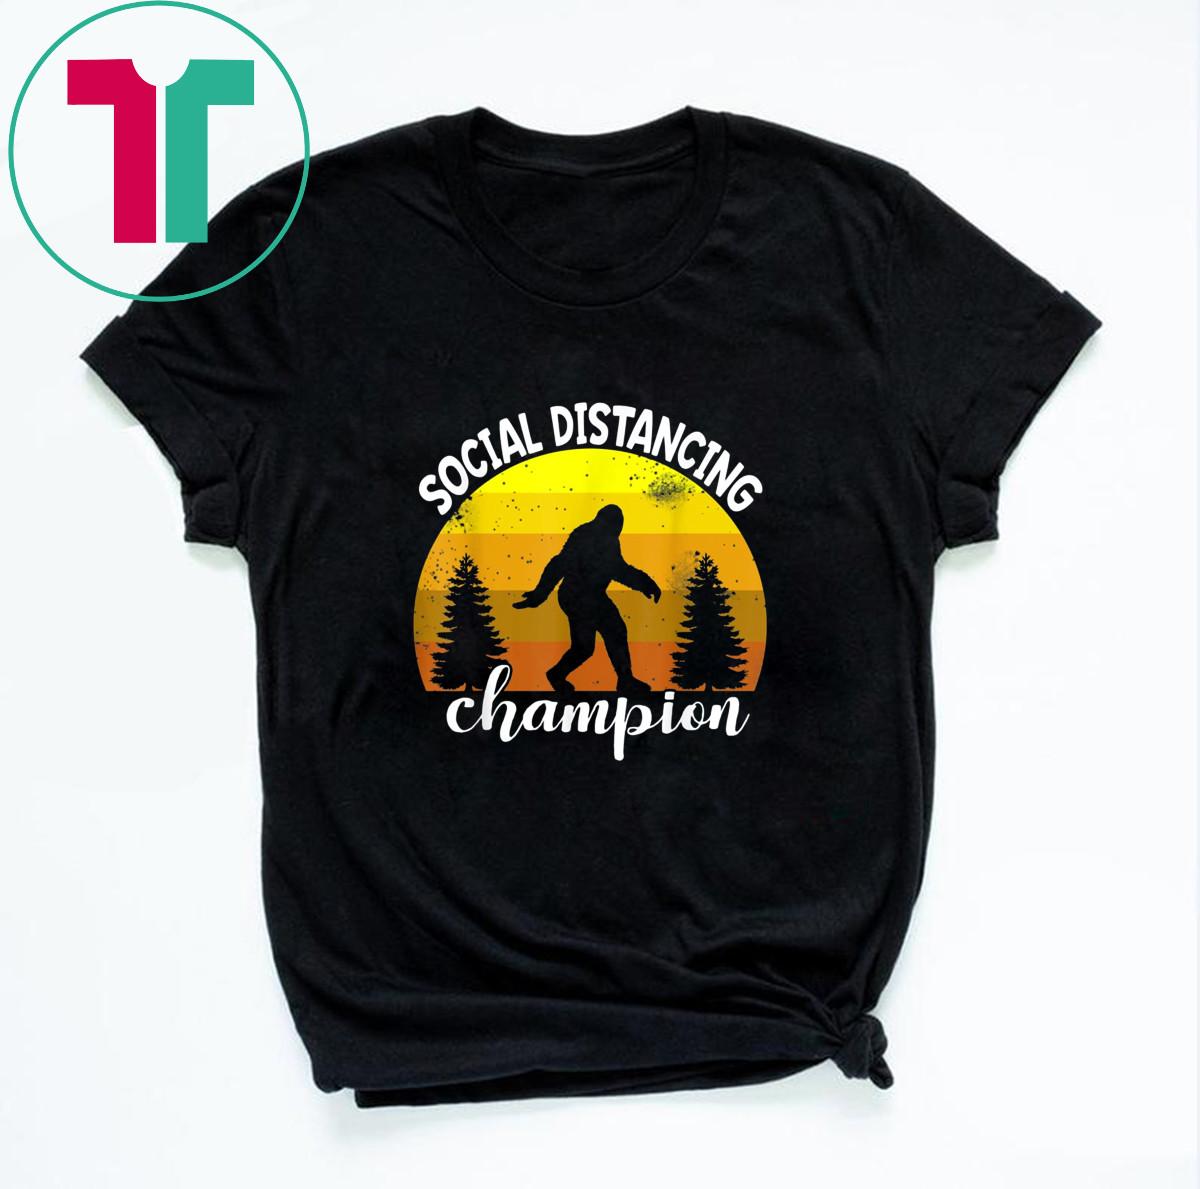 BigFoot Sasquatch Conspiracy Social Distance Champion T-Shirt